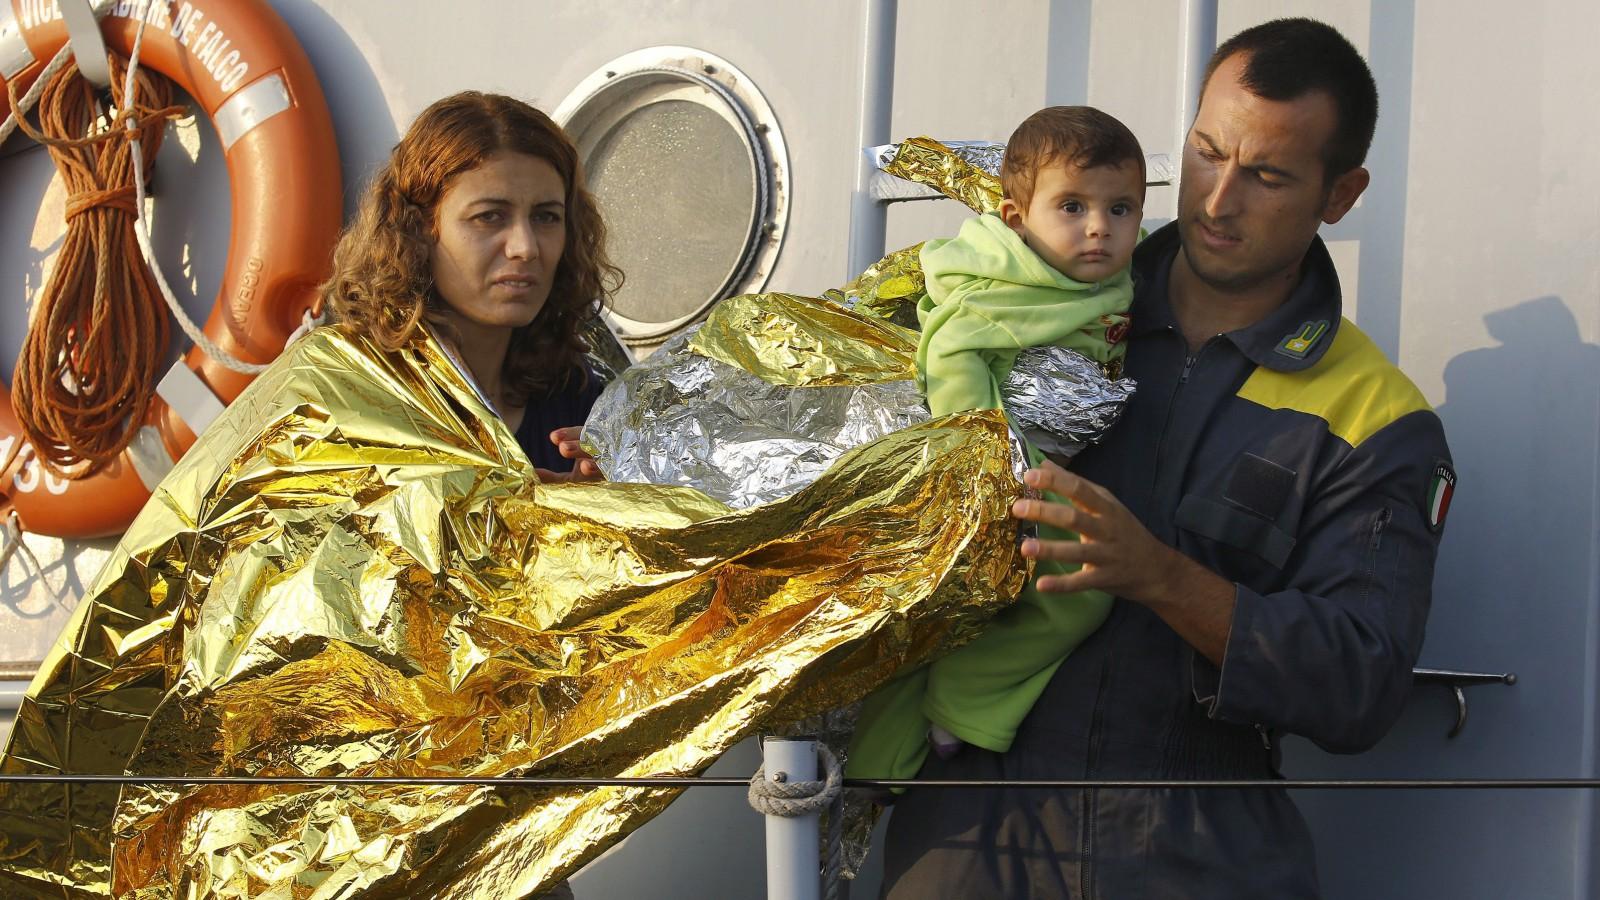 An Italian coast guard officer helps Syrian refugees from Kobani